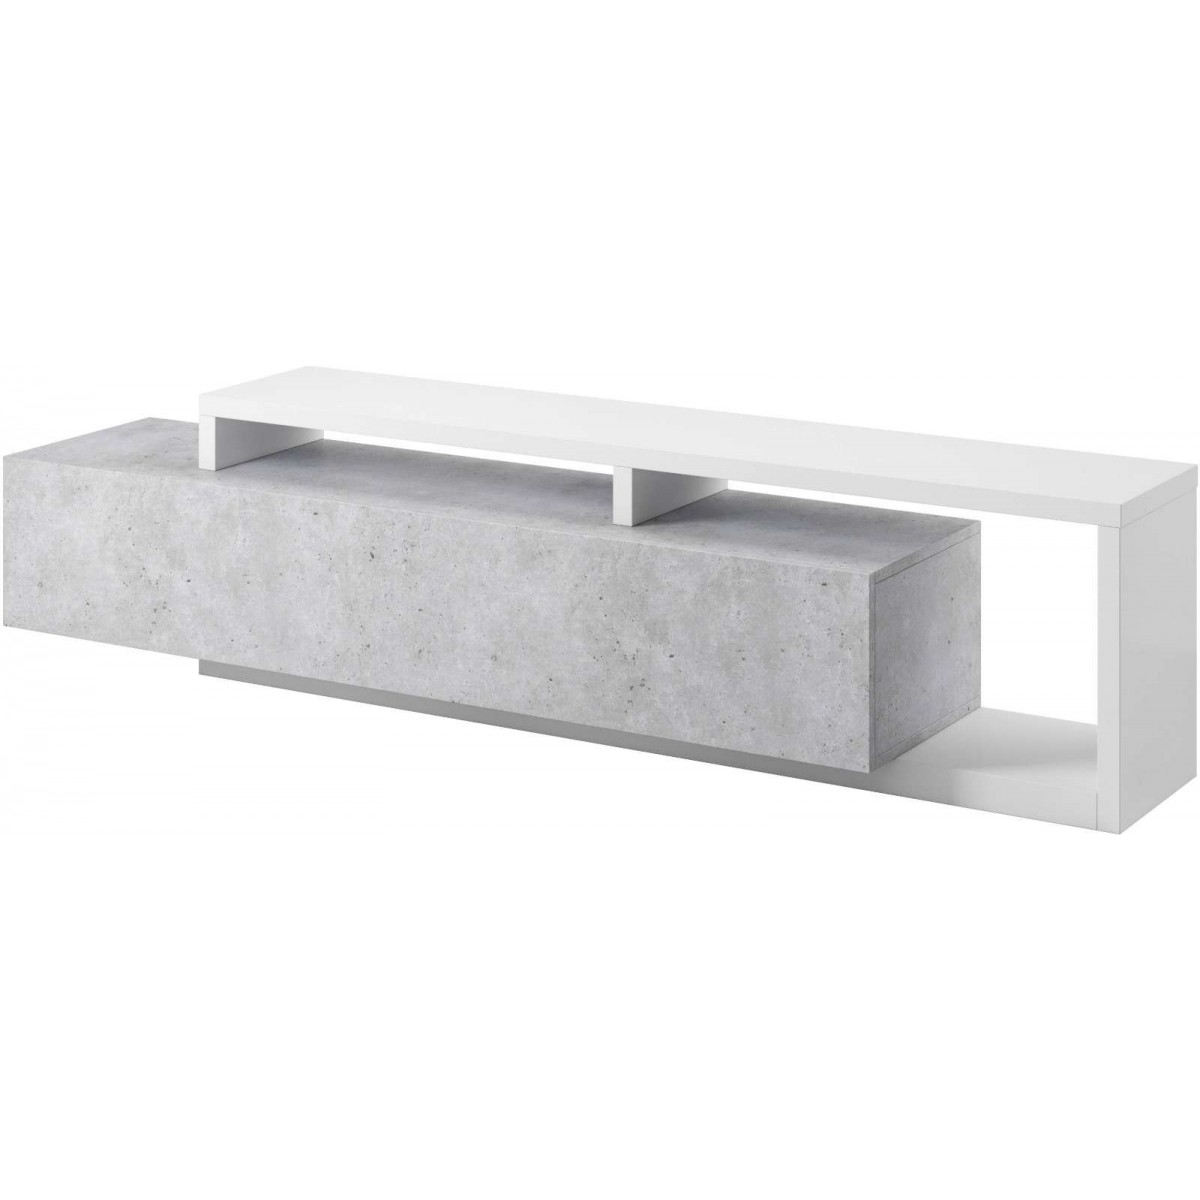 Bota Komoda TV Typ 40 biały / beton colorado